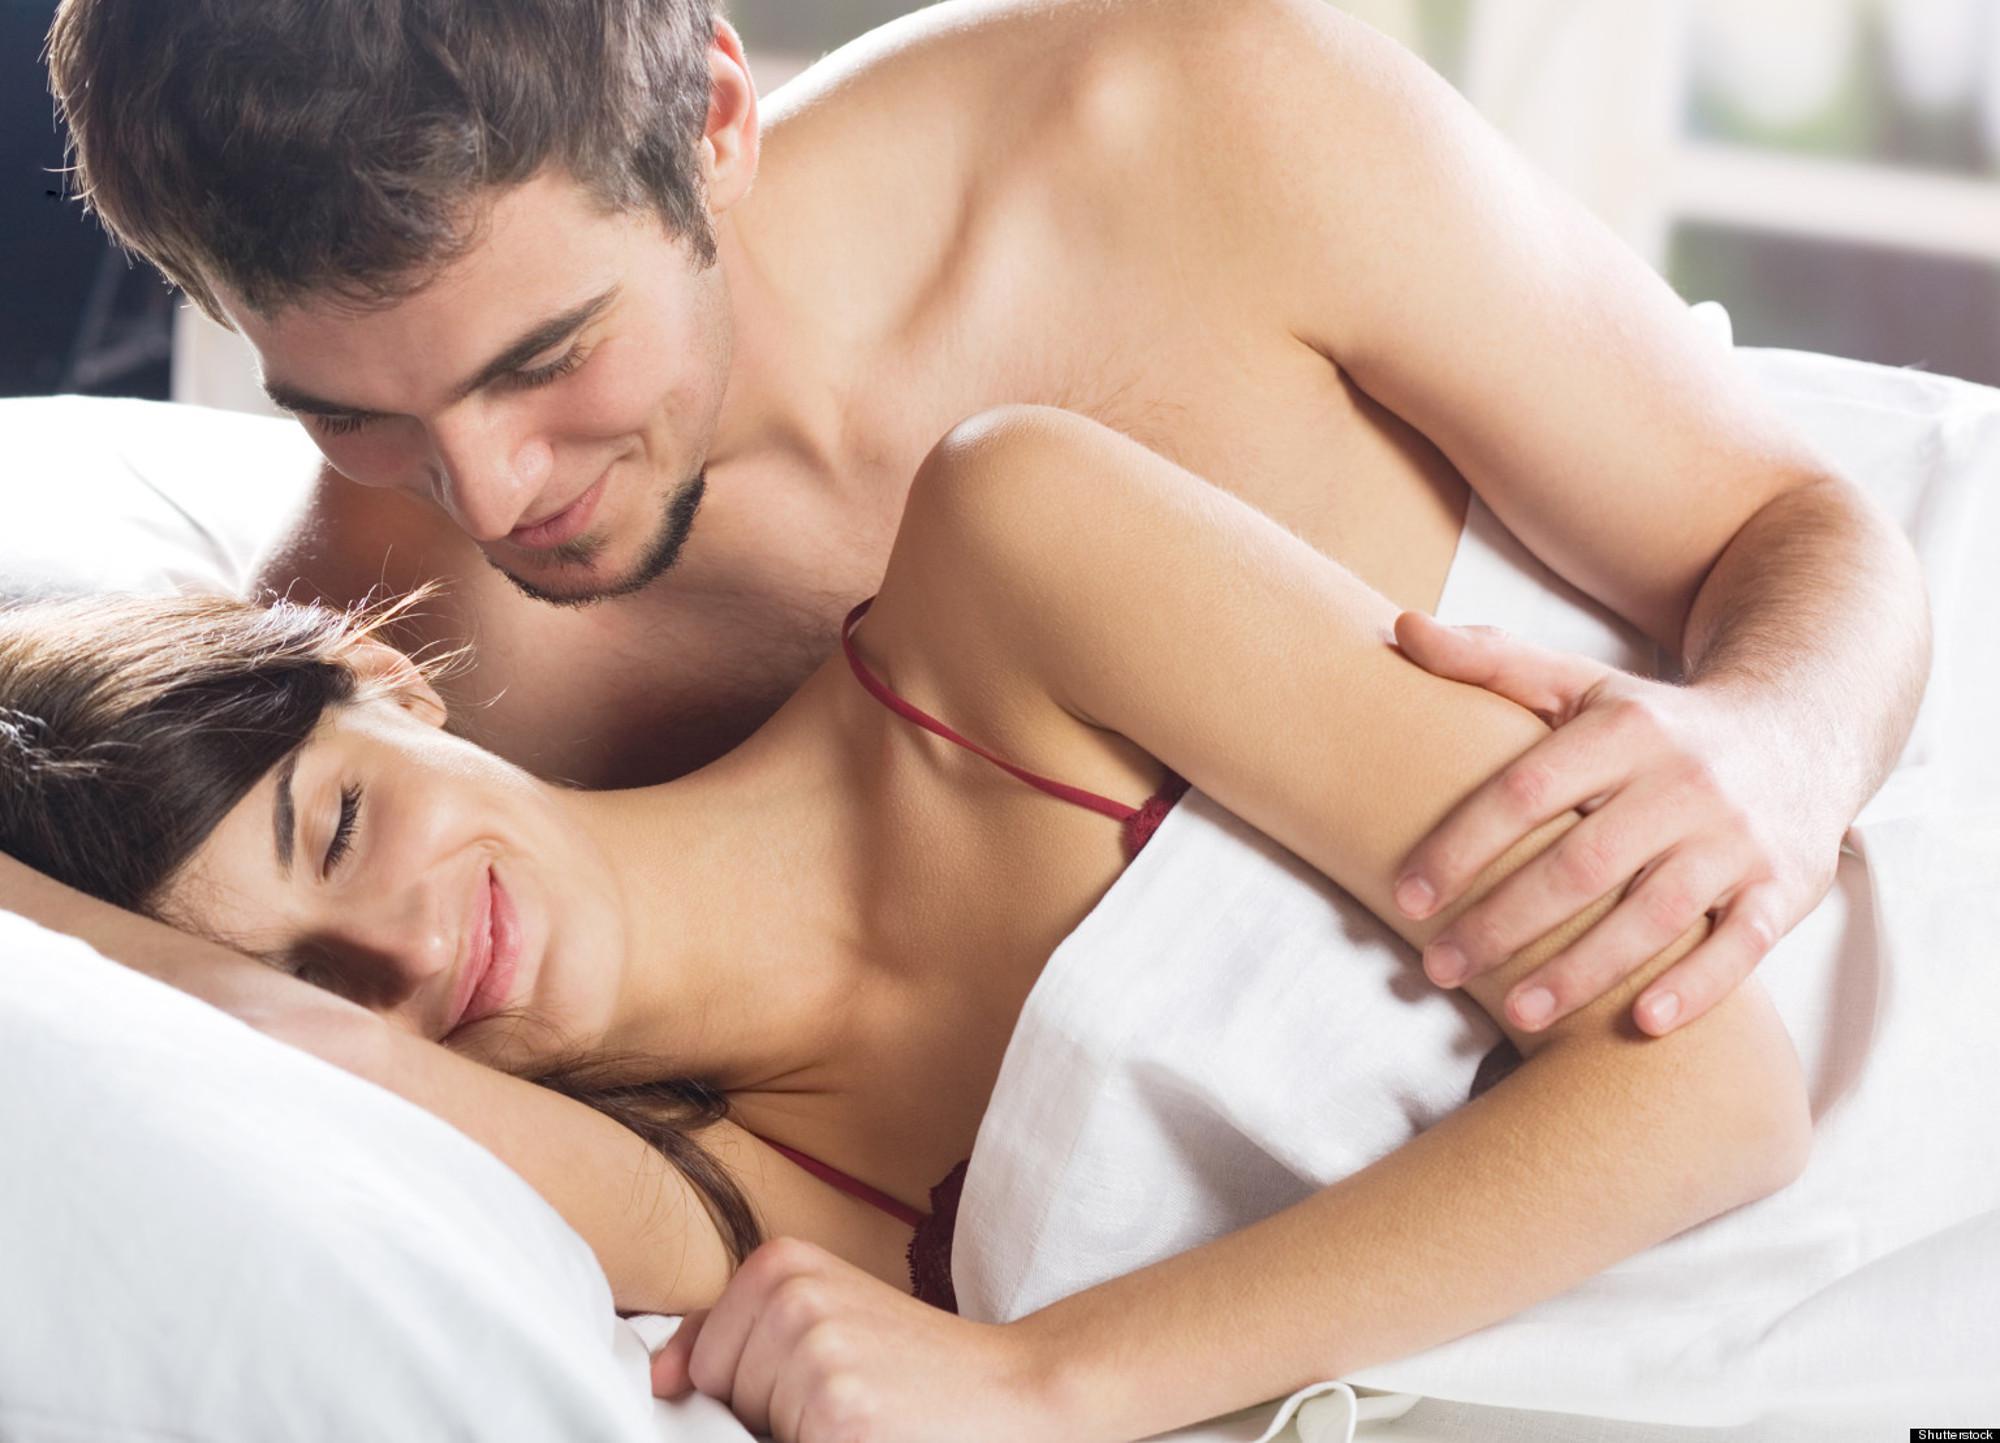 zeugari-sex-suntrofos-1300 Ερευνά: Τα κορίτσια των βορείων προαστίων ψάχνουν καλό σεξ και των δυτικών την ασφάλεια